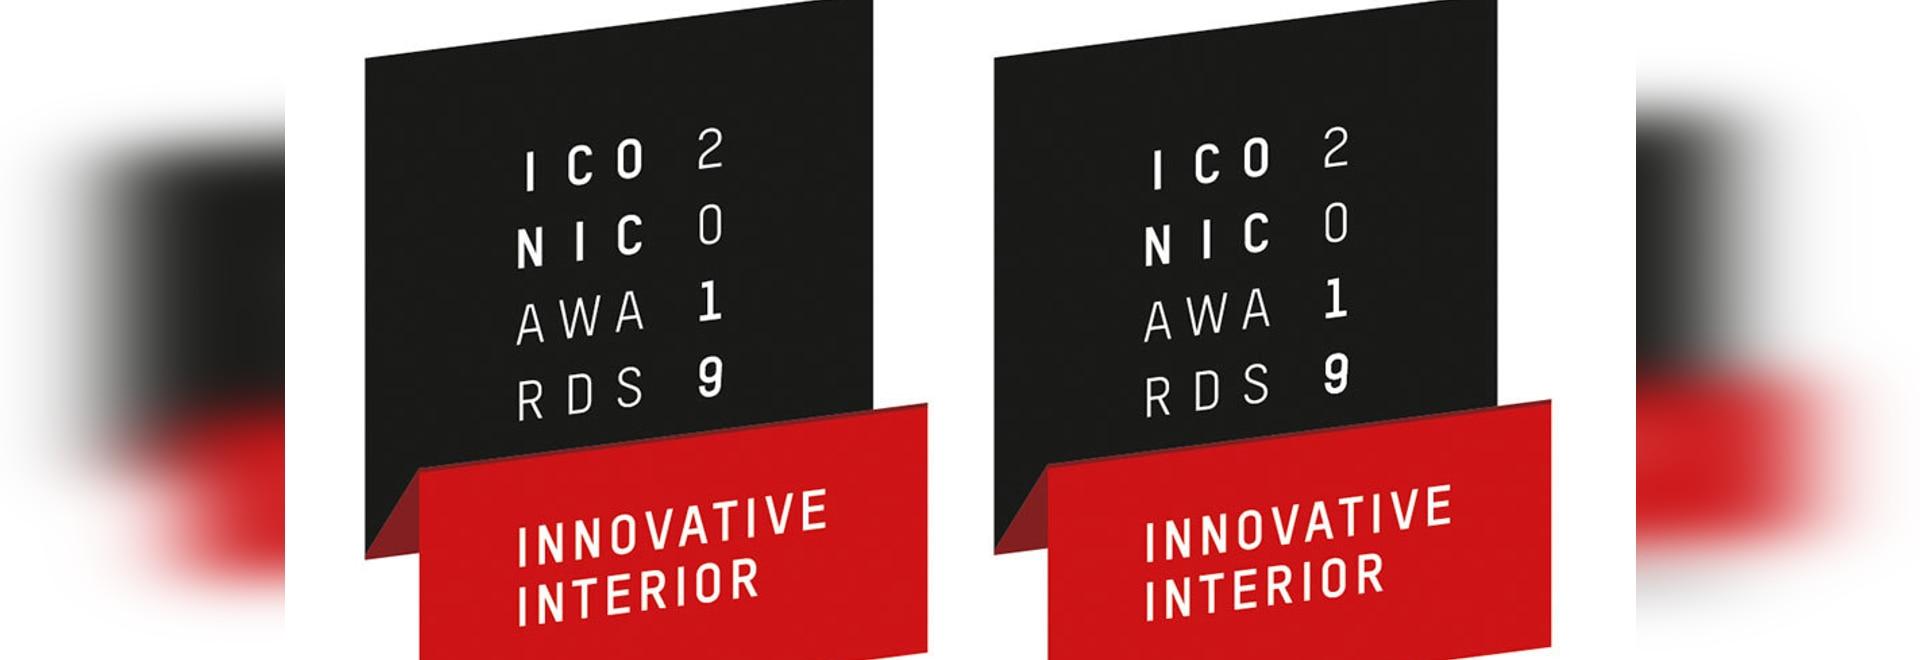 ICONIC AWARDS 2019 Winner & Selection